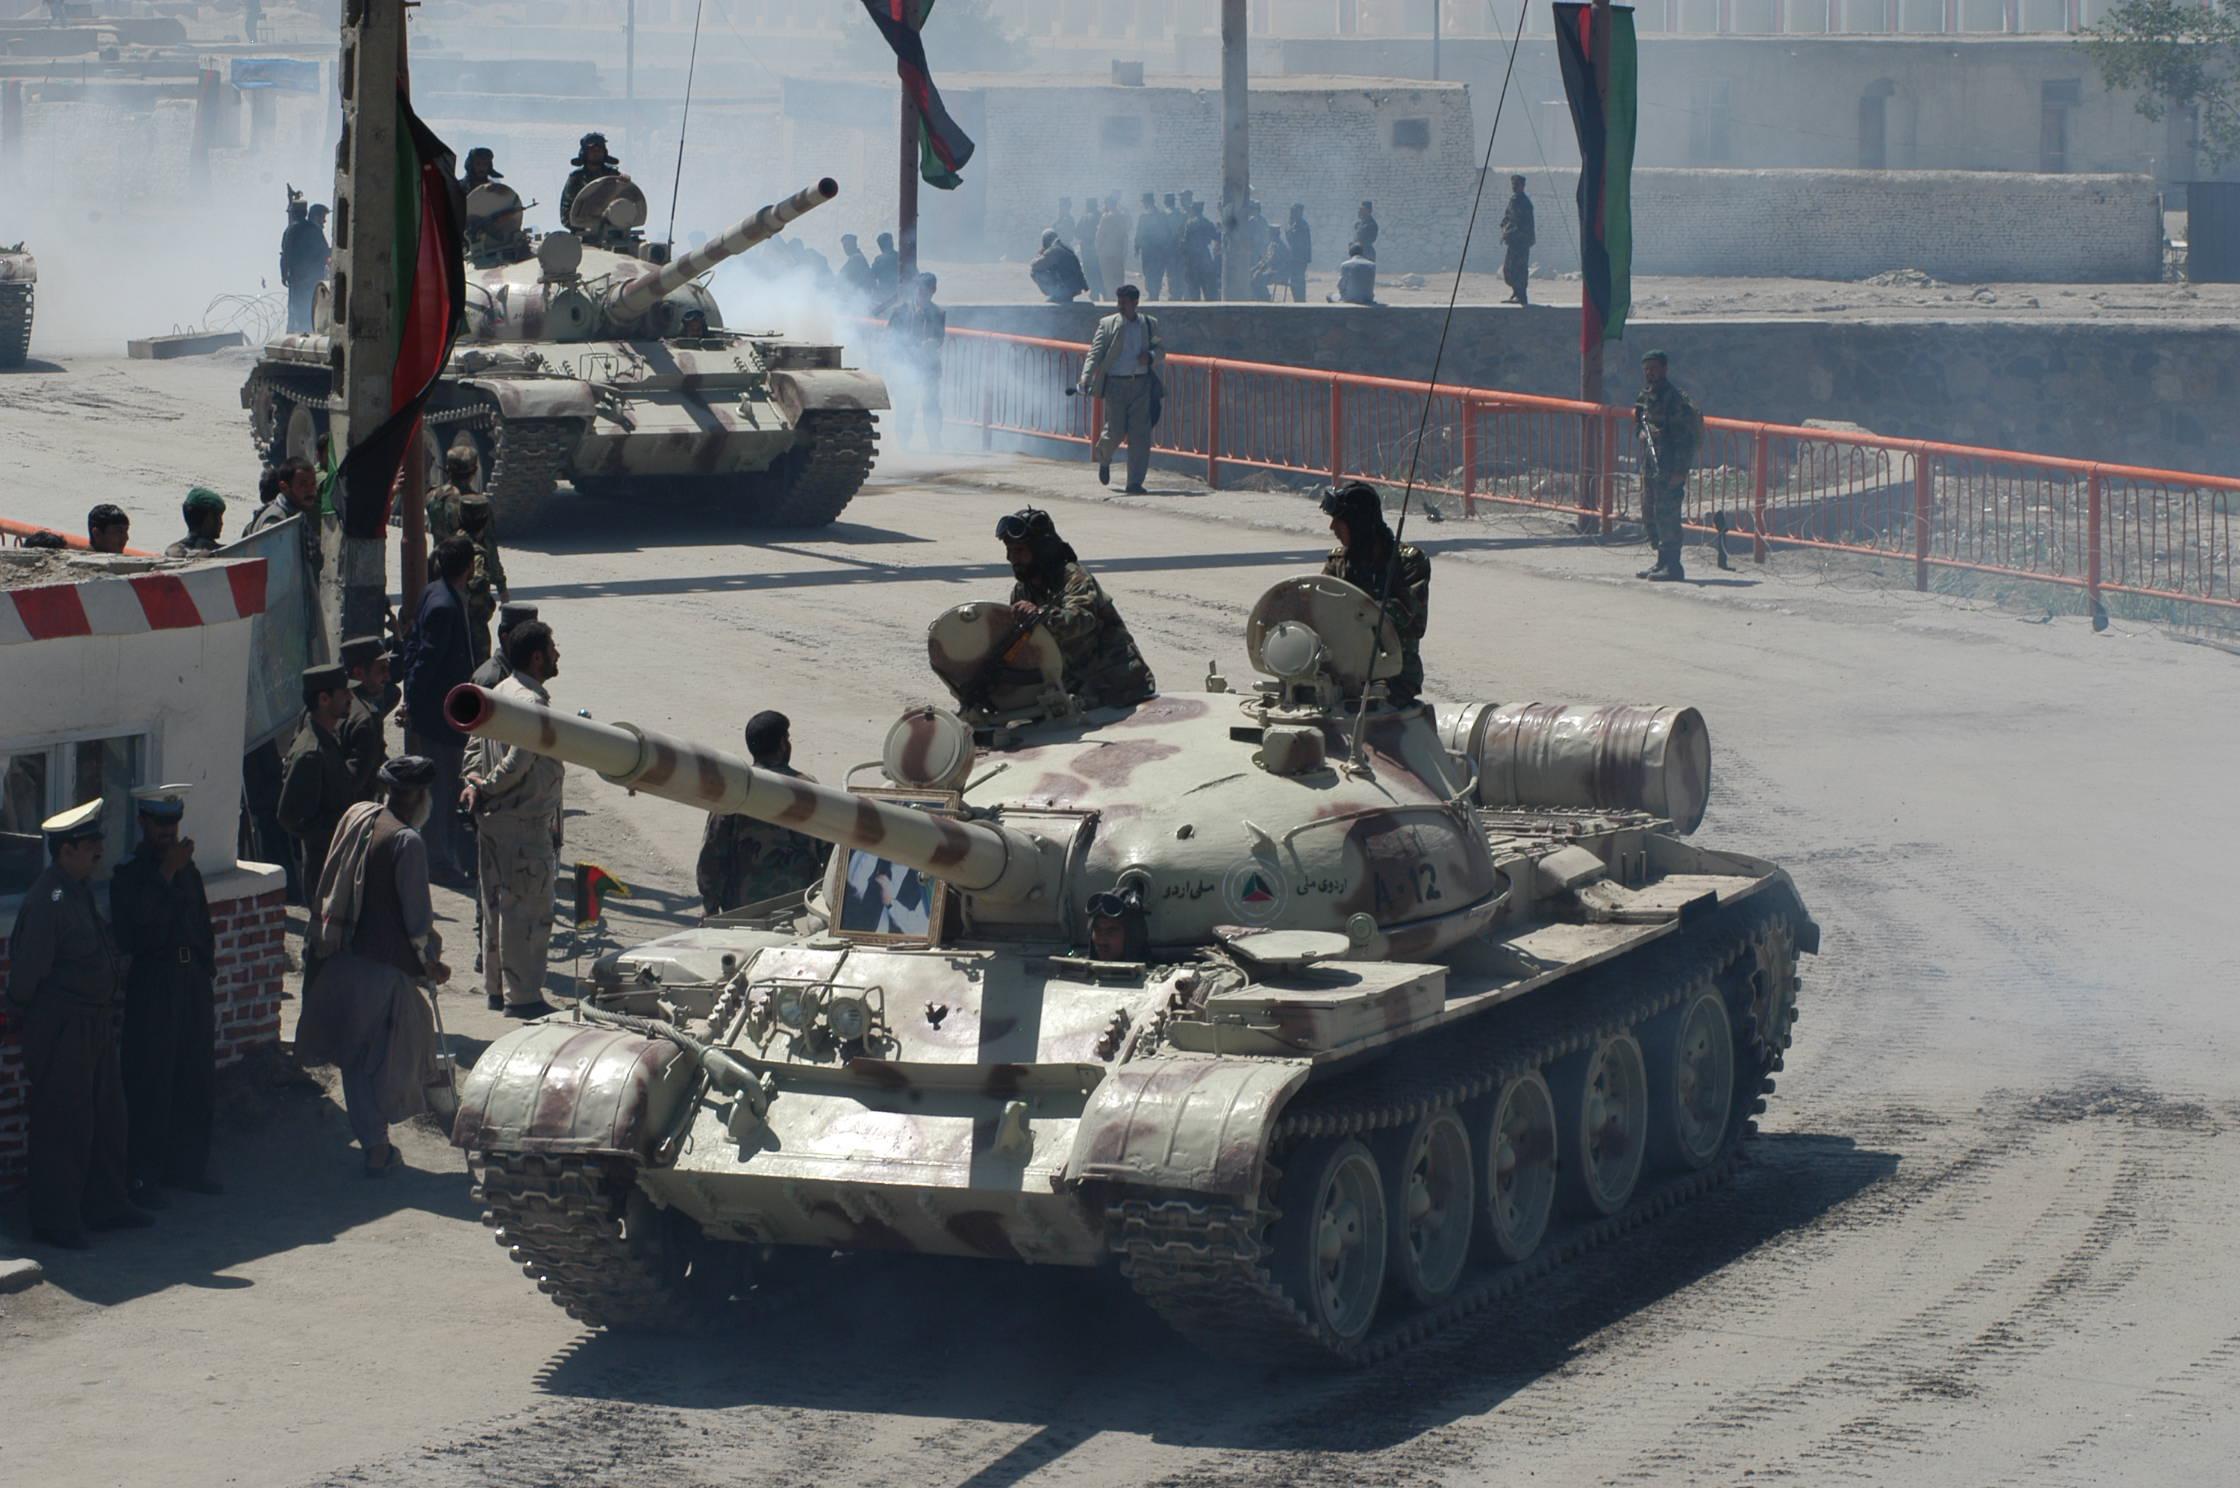 http://upload.wikimedia.org/wikipedia/commons/0/03/T62_Afghanistan.JPG